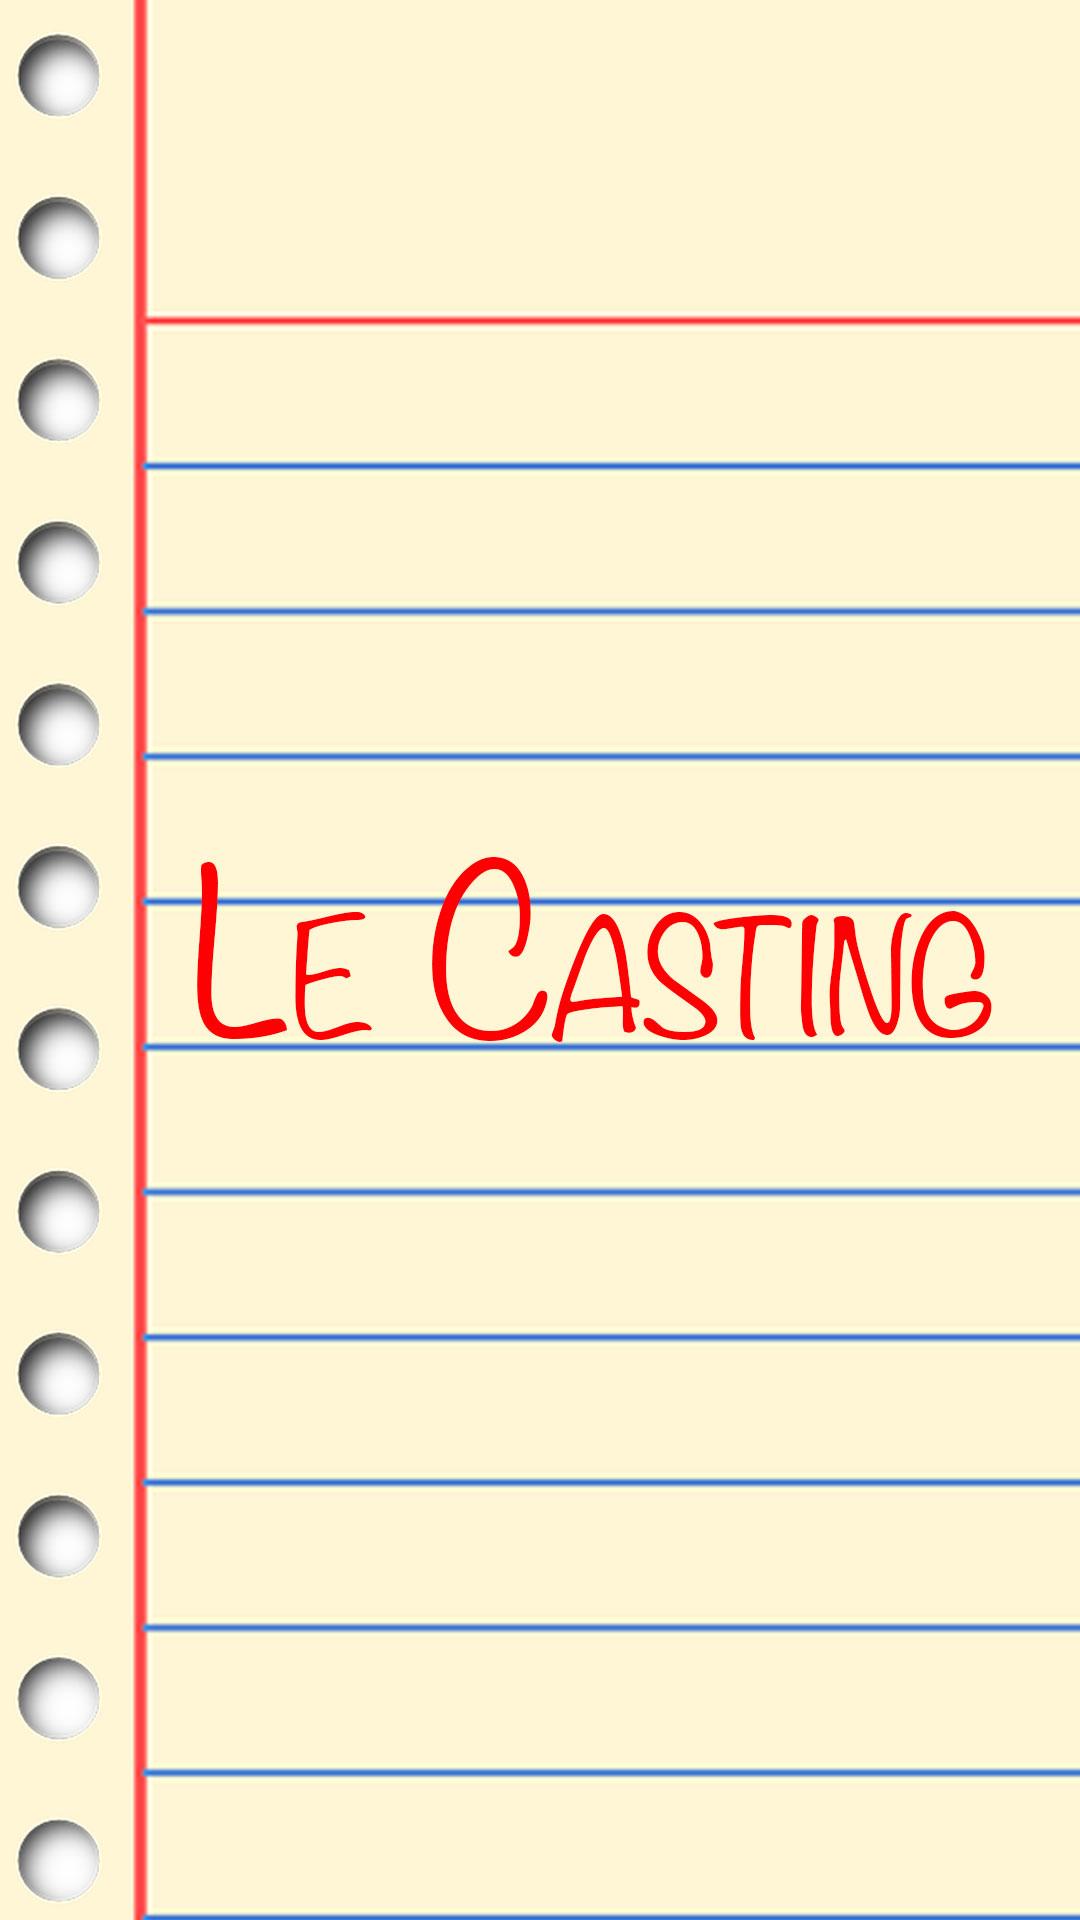 Le Casting